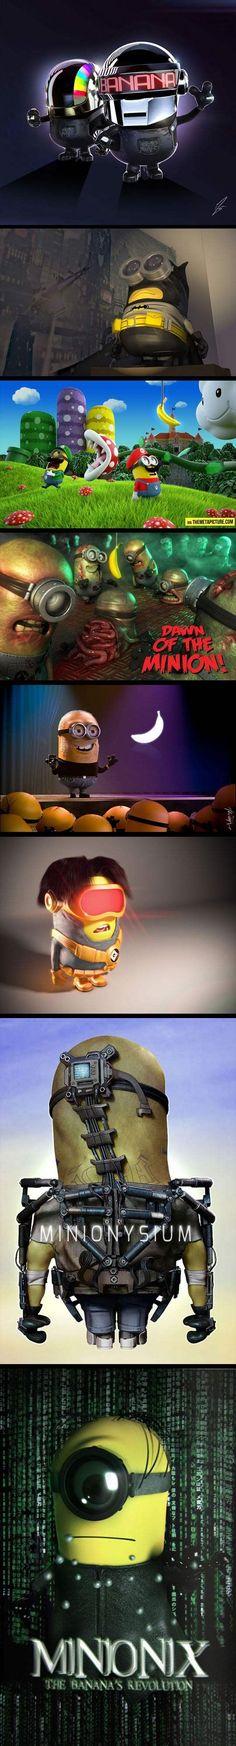 Minions... Minions Everywhere - OhGizmo!